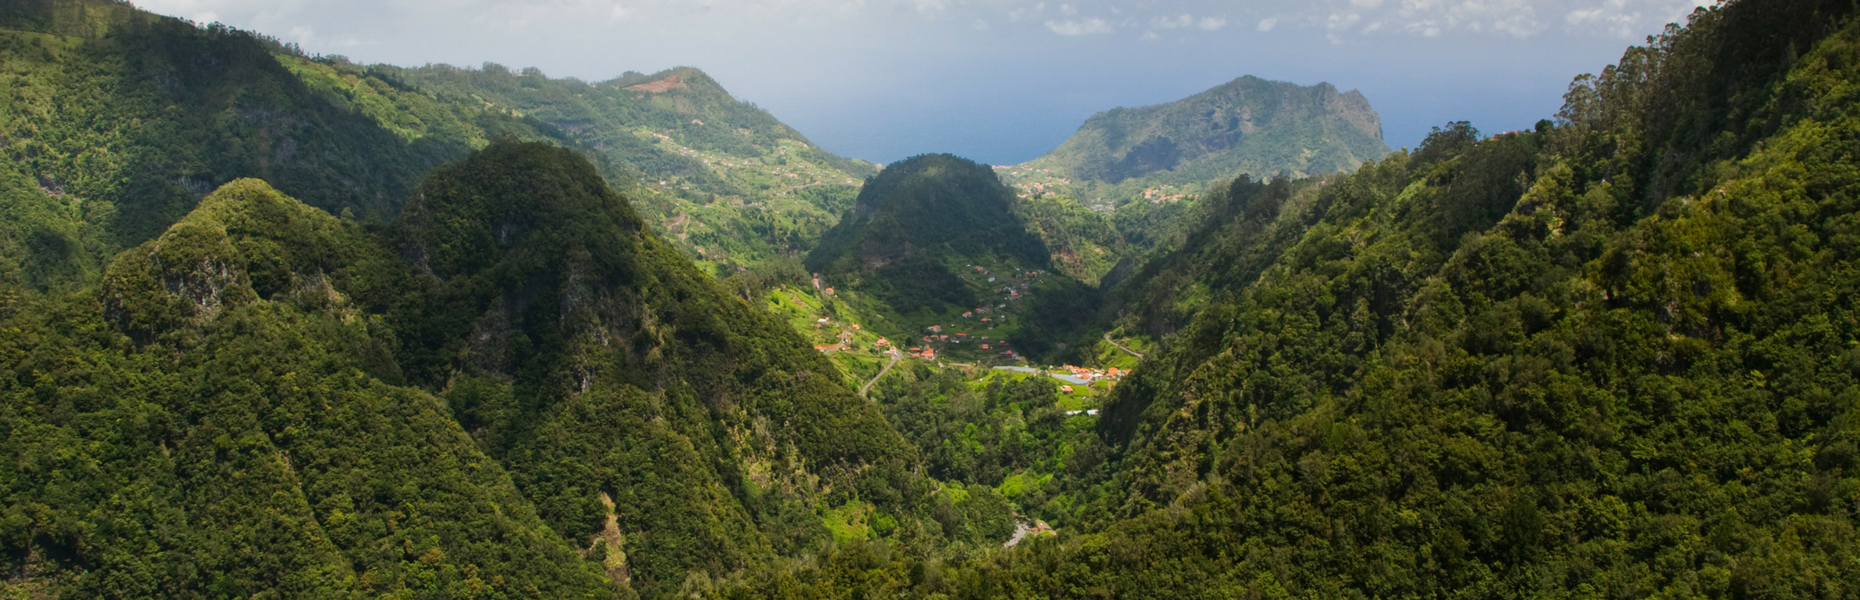 Fsc And Rainforest Alliance Certificates Vita Talalay